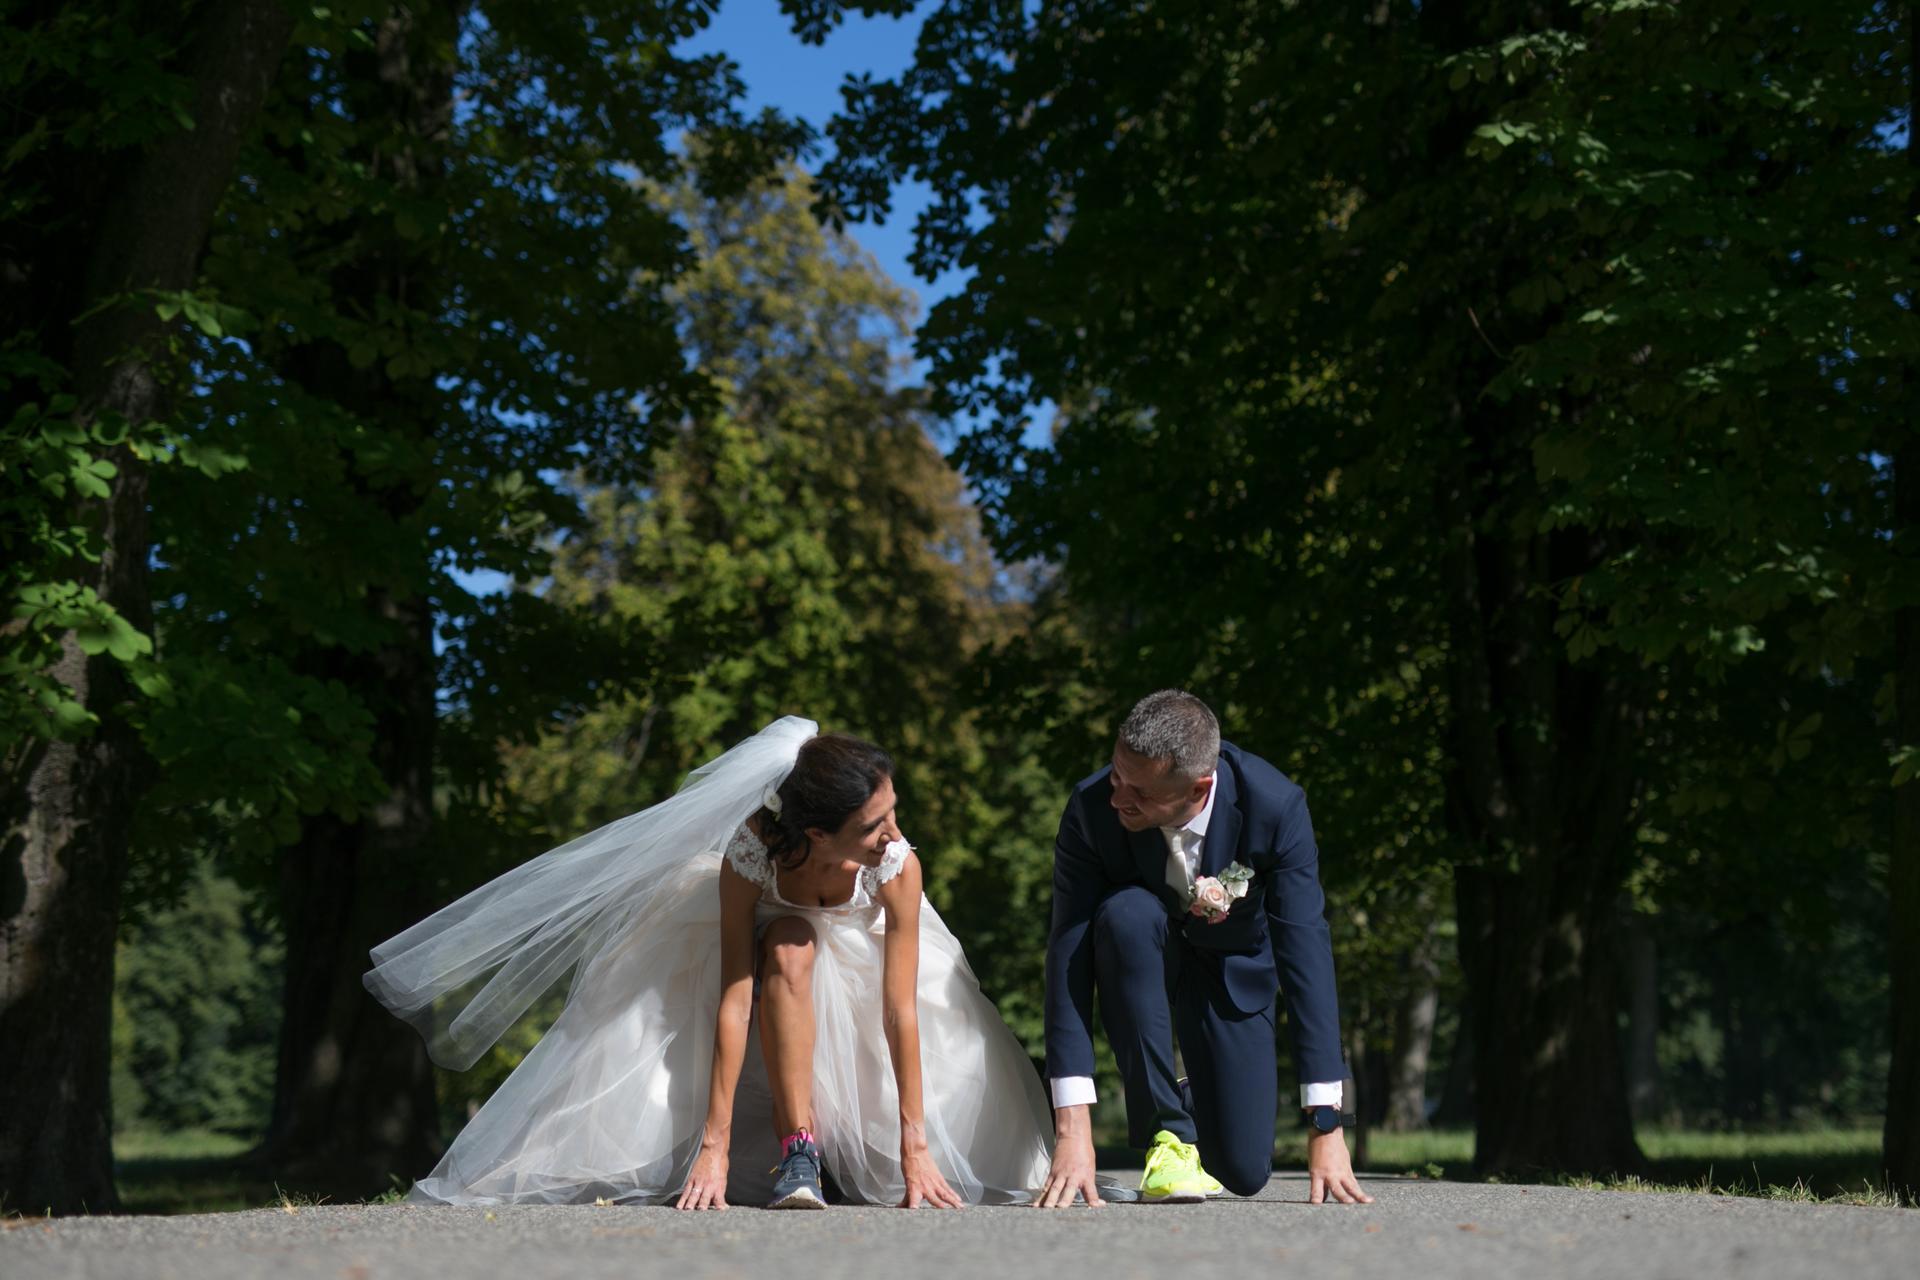 Naša svadba - kedže sme bežci, máme pár takých tématických